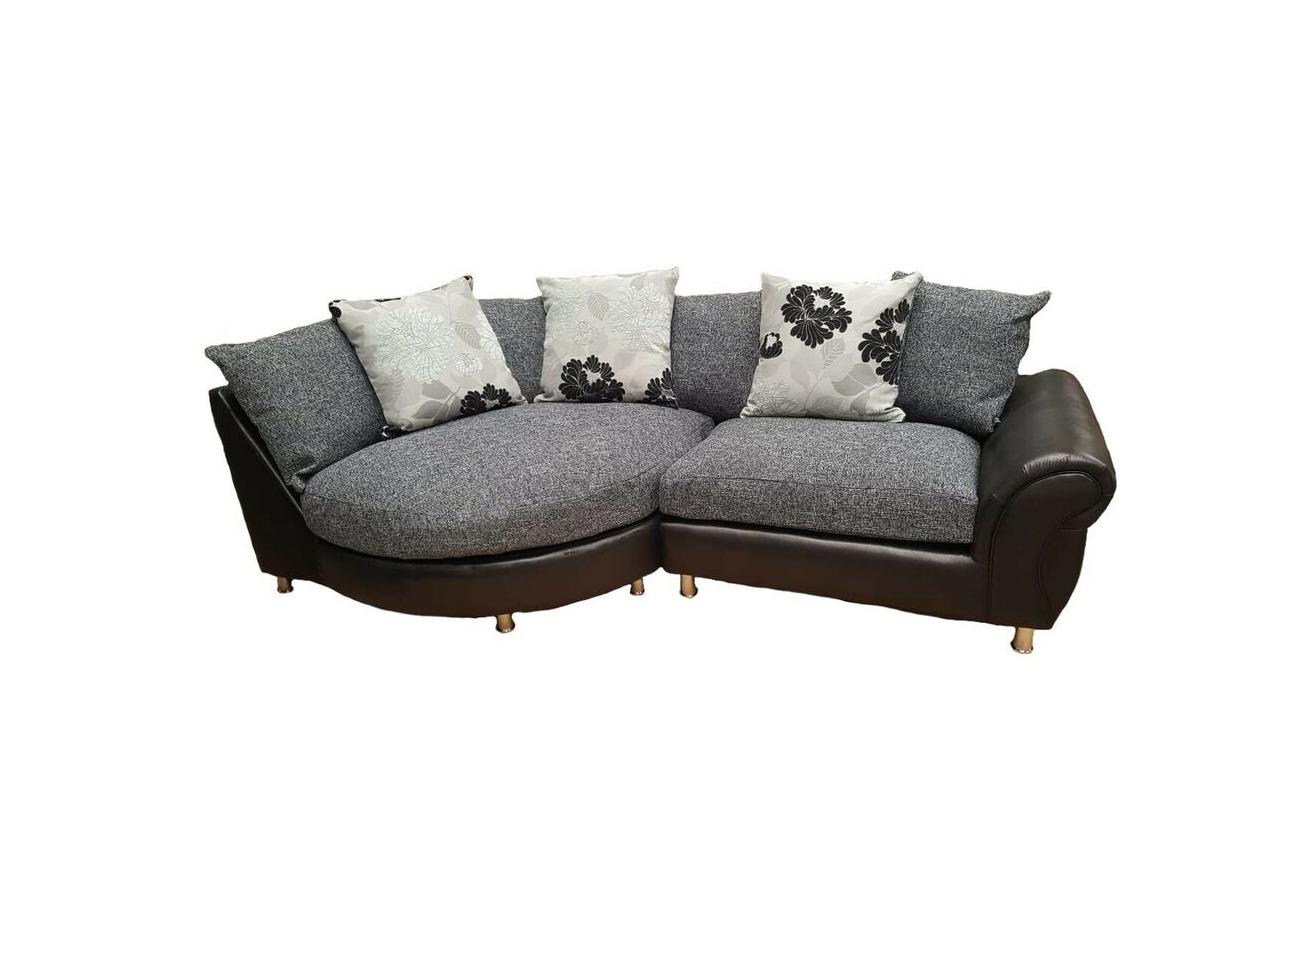 Terrific Buy Brand New Large Elise Corner Sofa In Black Grey Bralicious Painted Fabric Chair Ideas Braliciousco